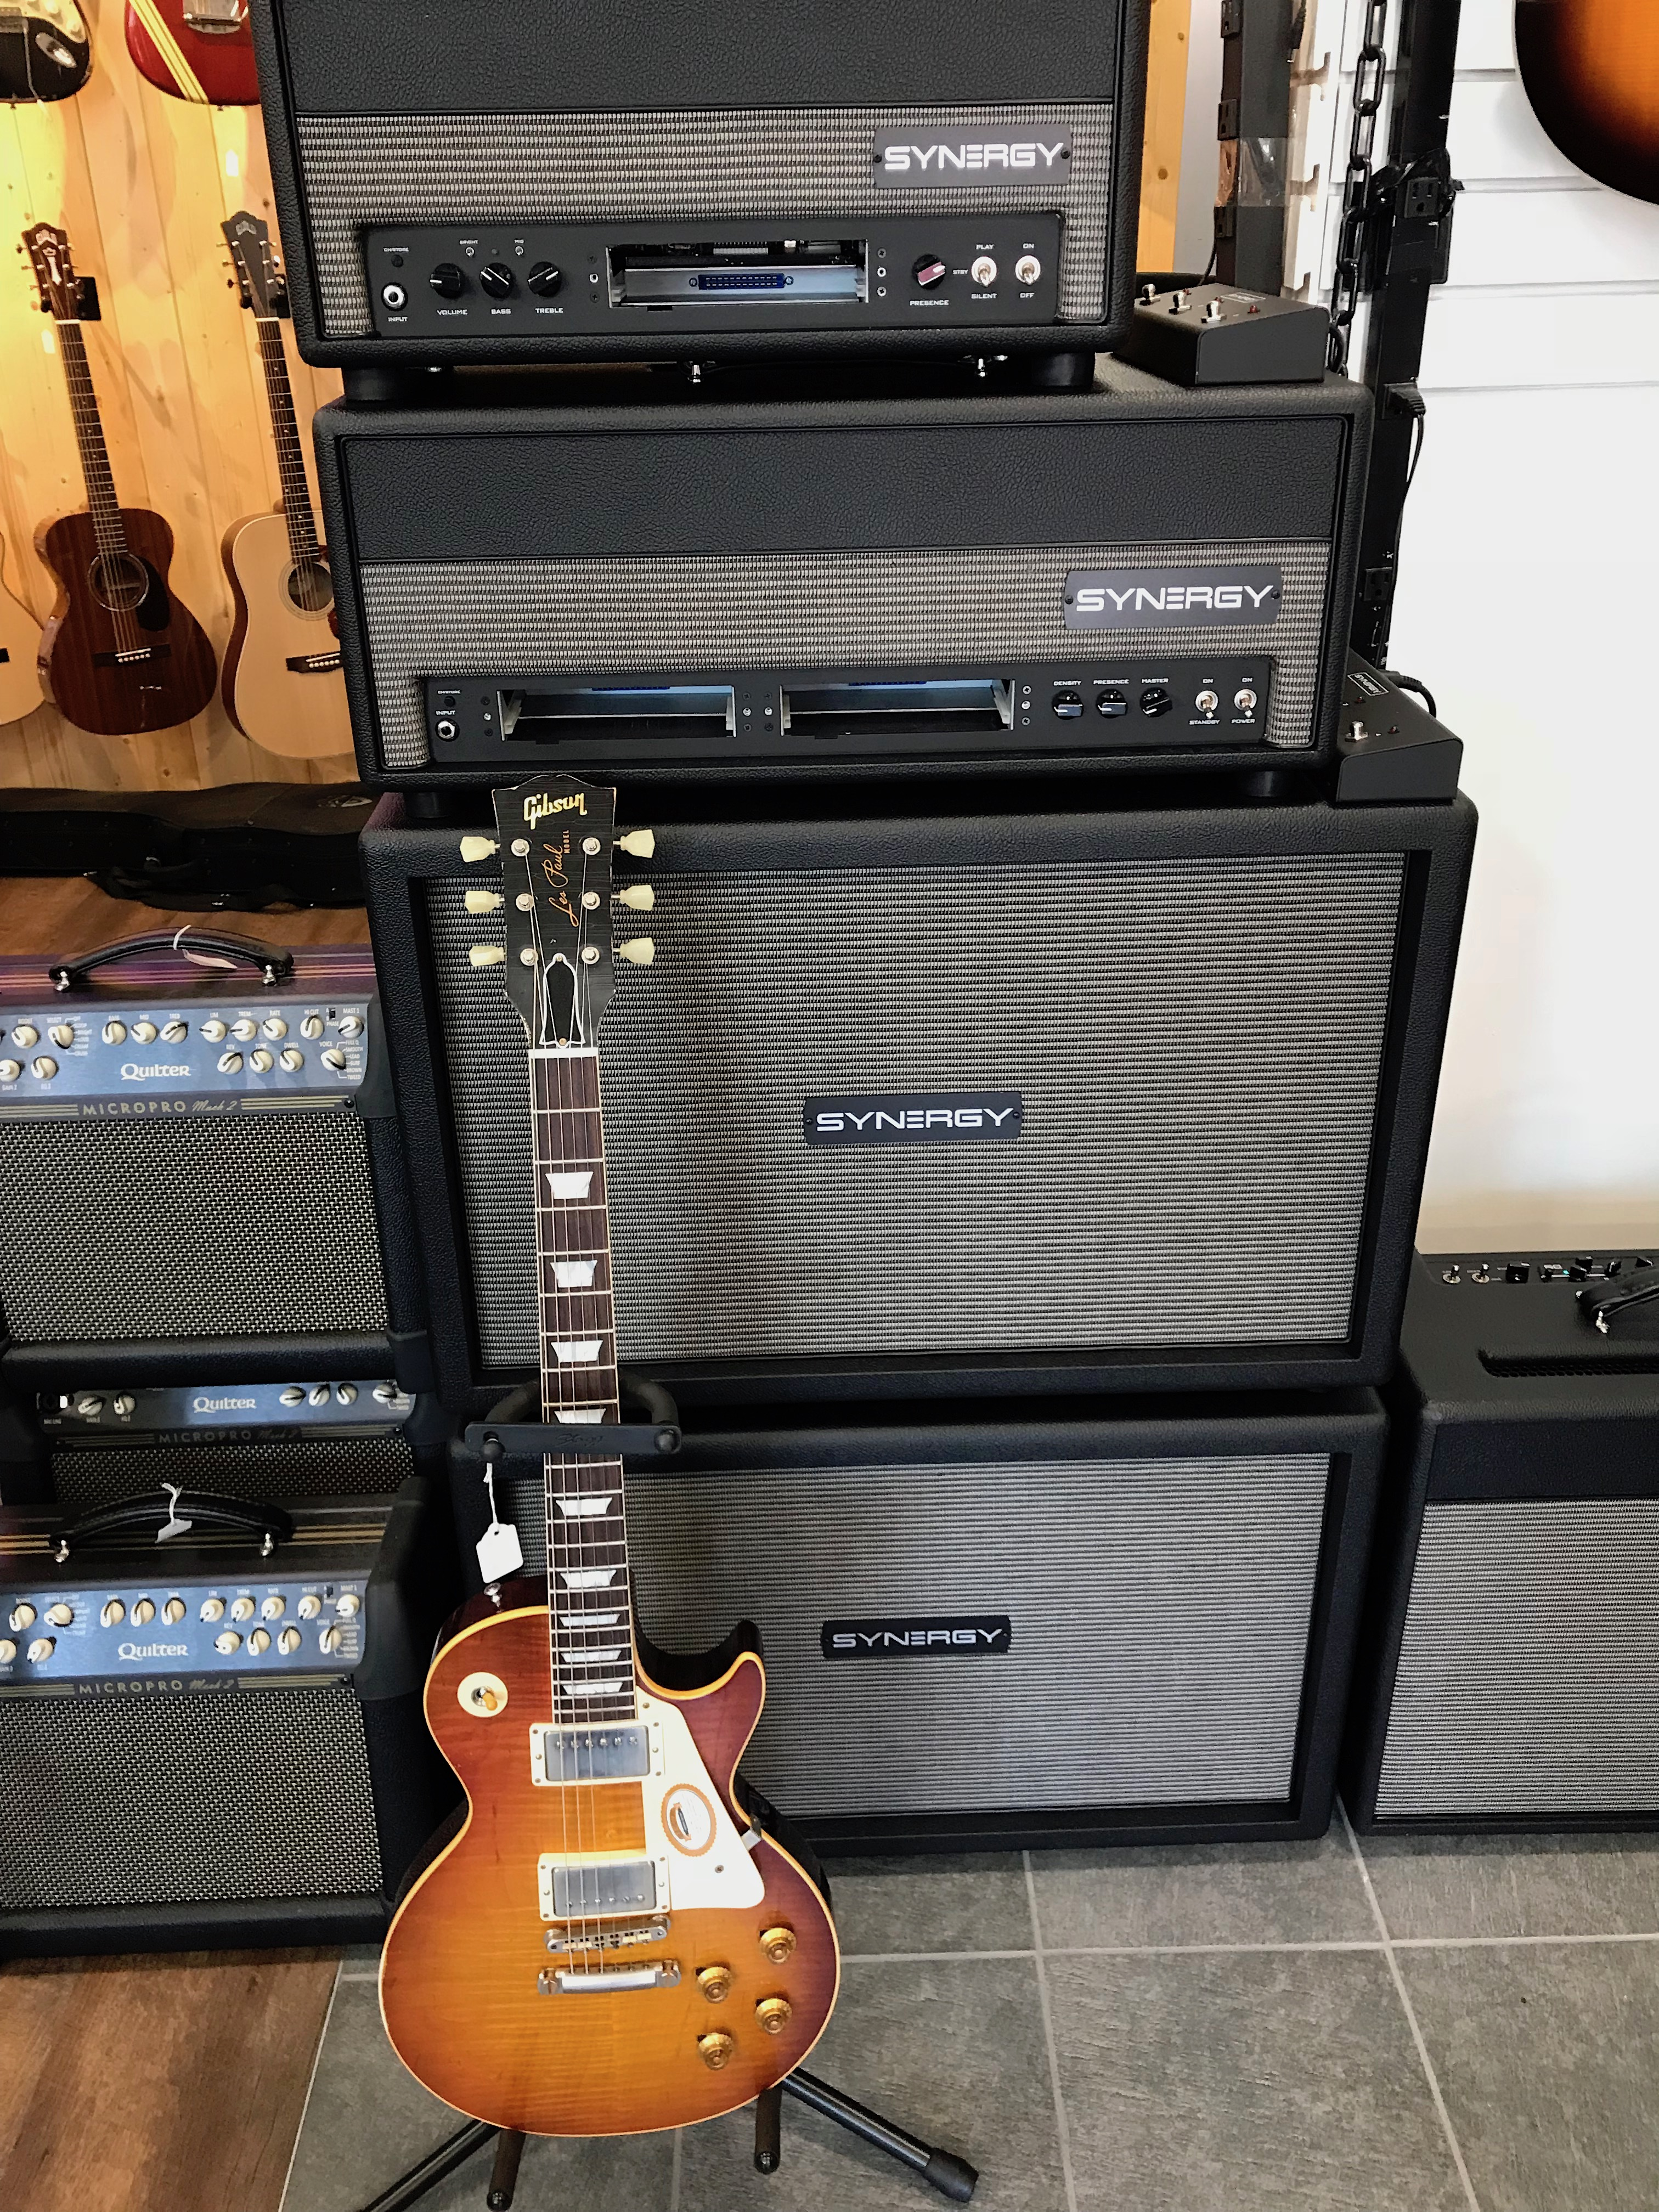 Synergy Amps & Modules Westcoast Guitars Canada